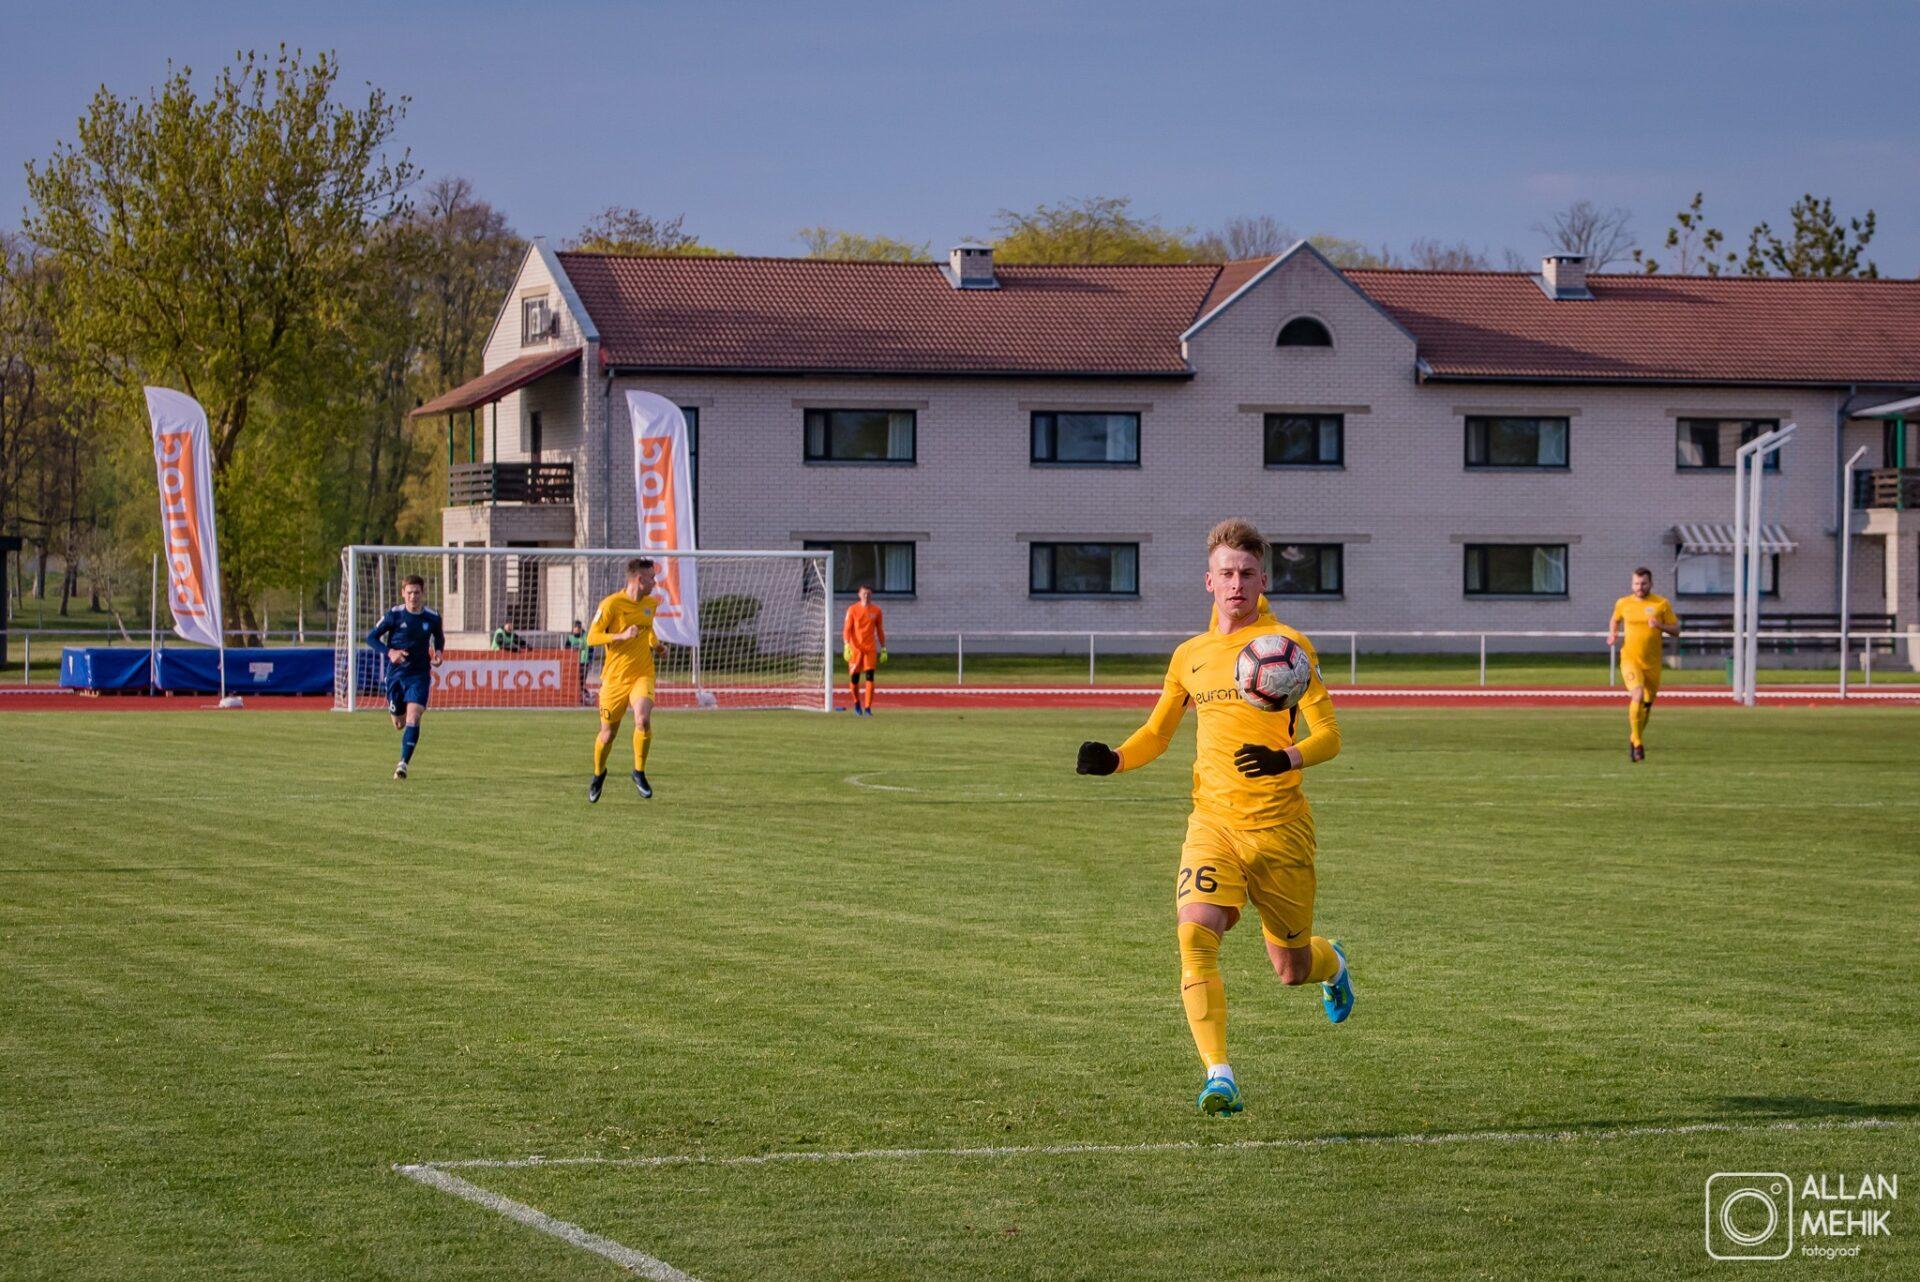 Allan Mehik/soccernet